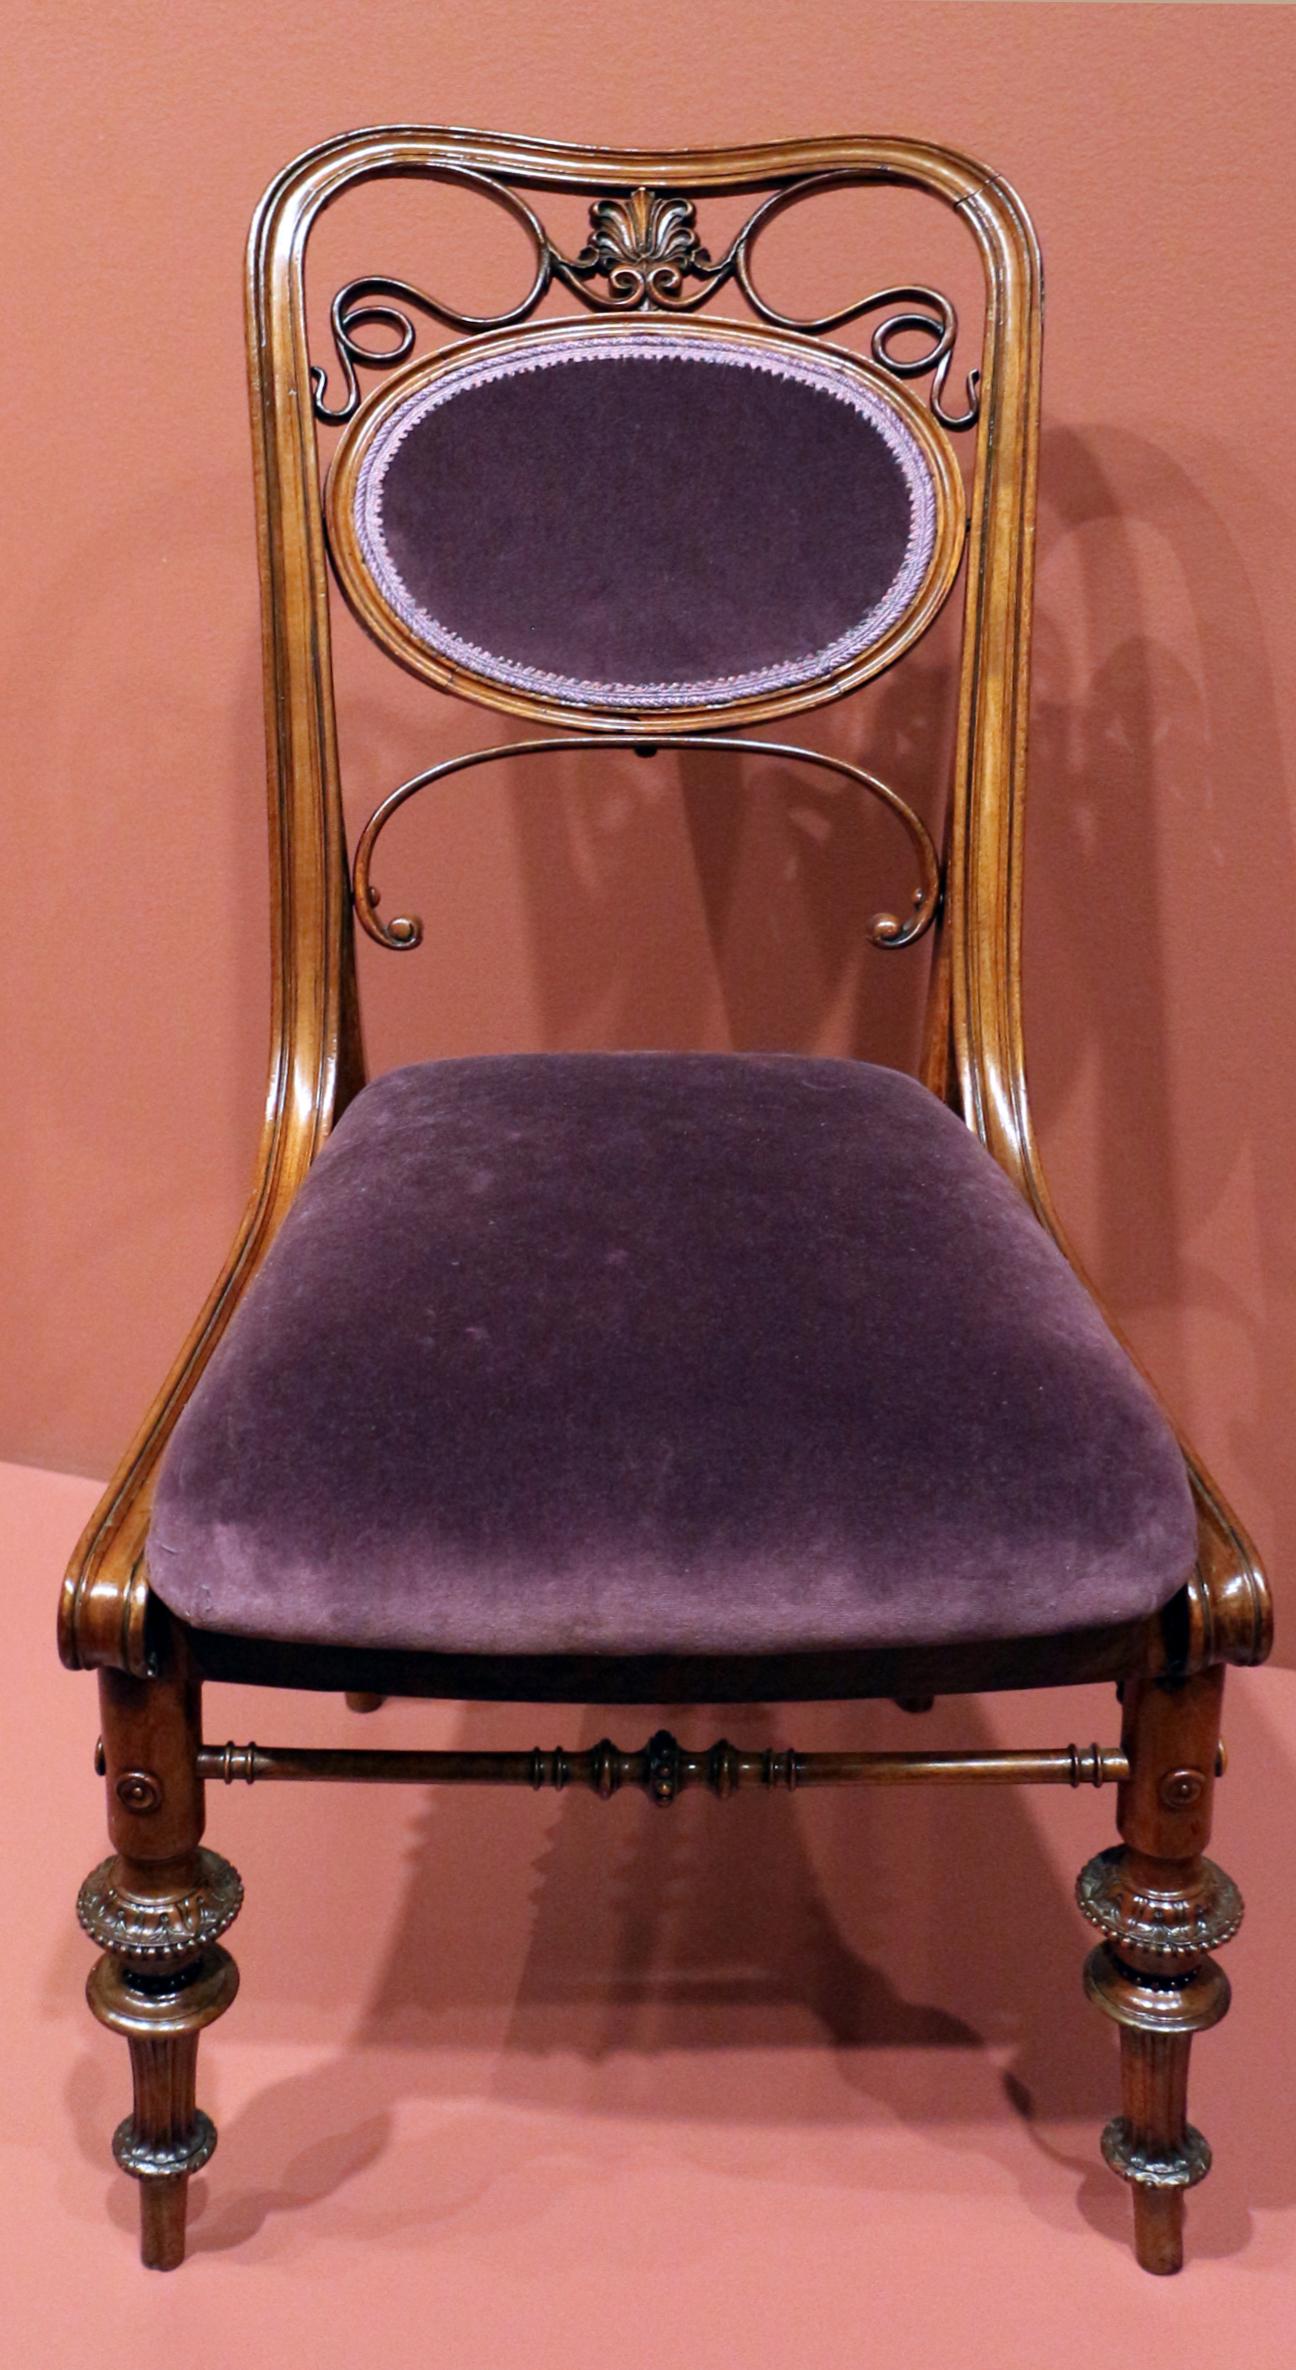 File:Theophil hansen per stephan wichers, sedia per sala da pranzo ...